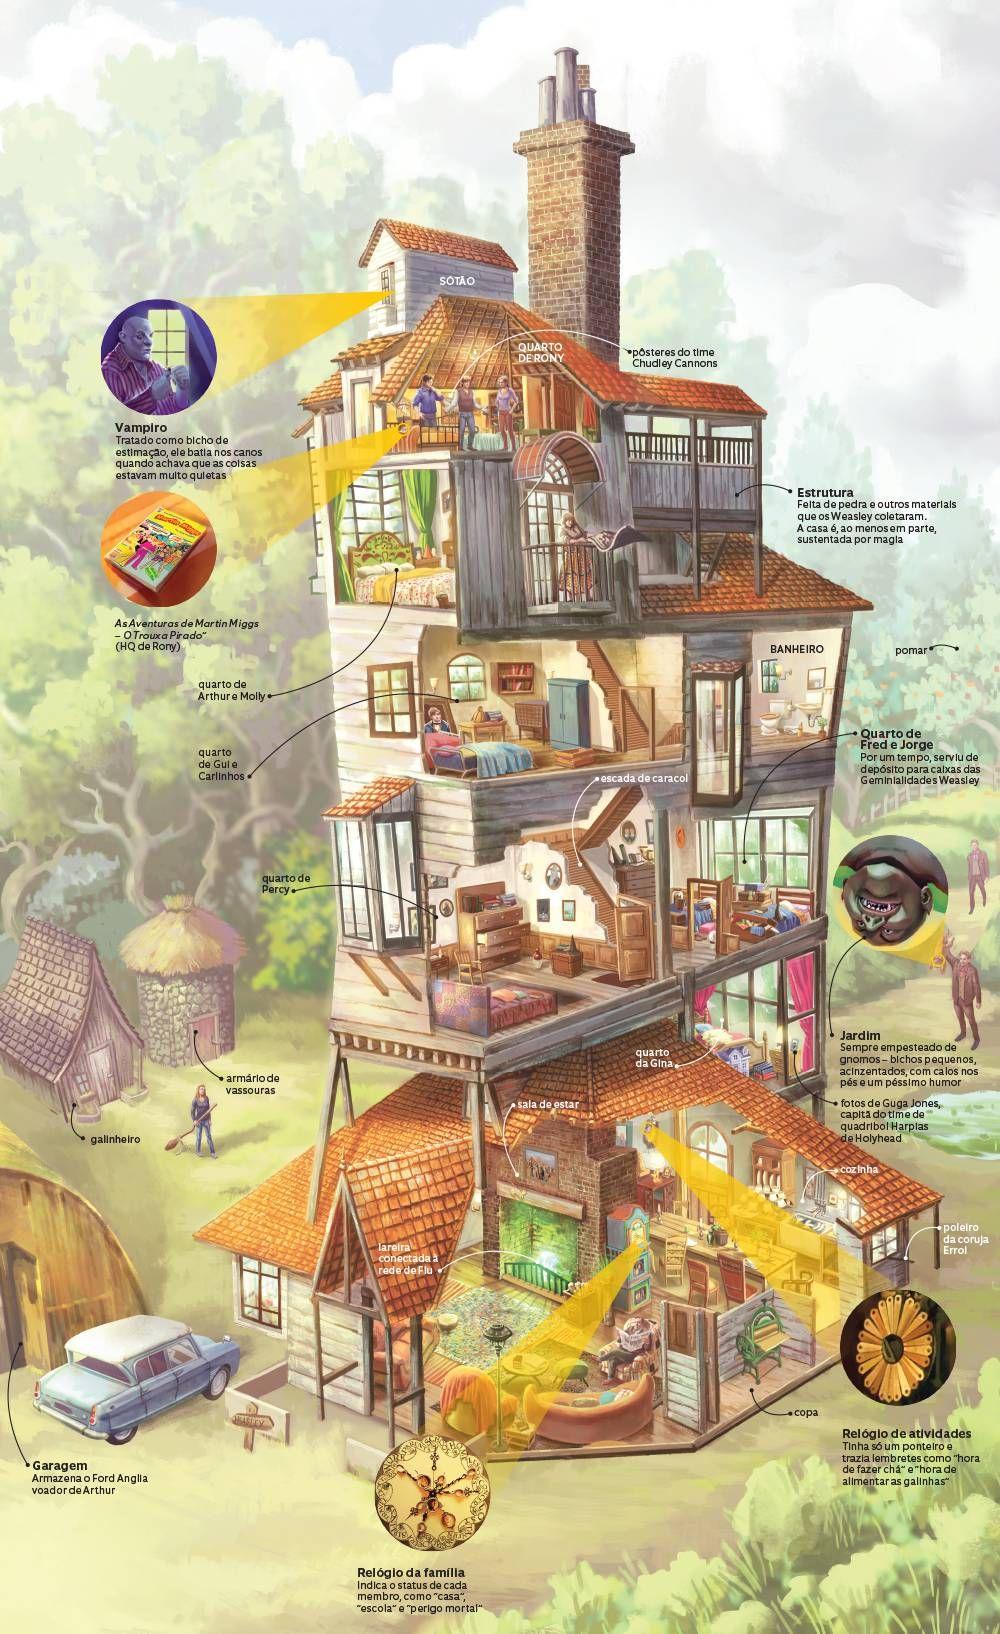 Infográfico: a Toca da família Weasley, de Harry Potter Harry Potter and the Chamber of Secrets